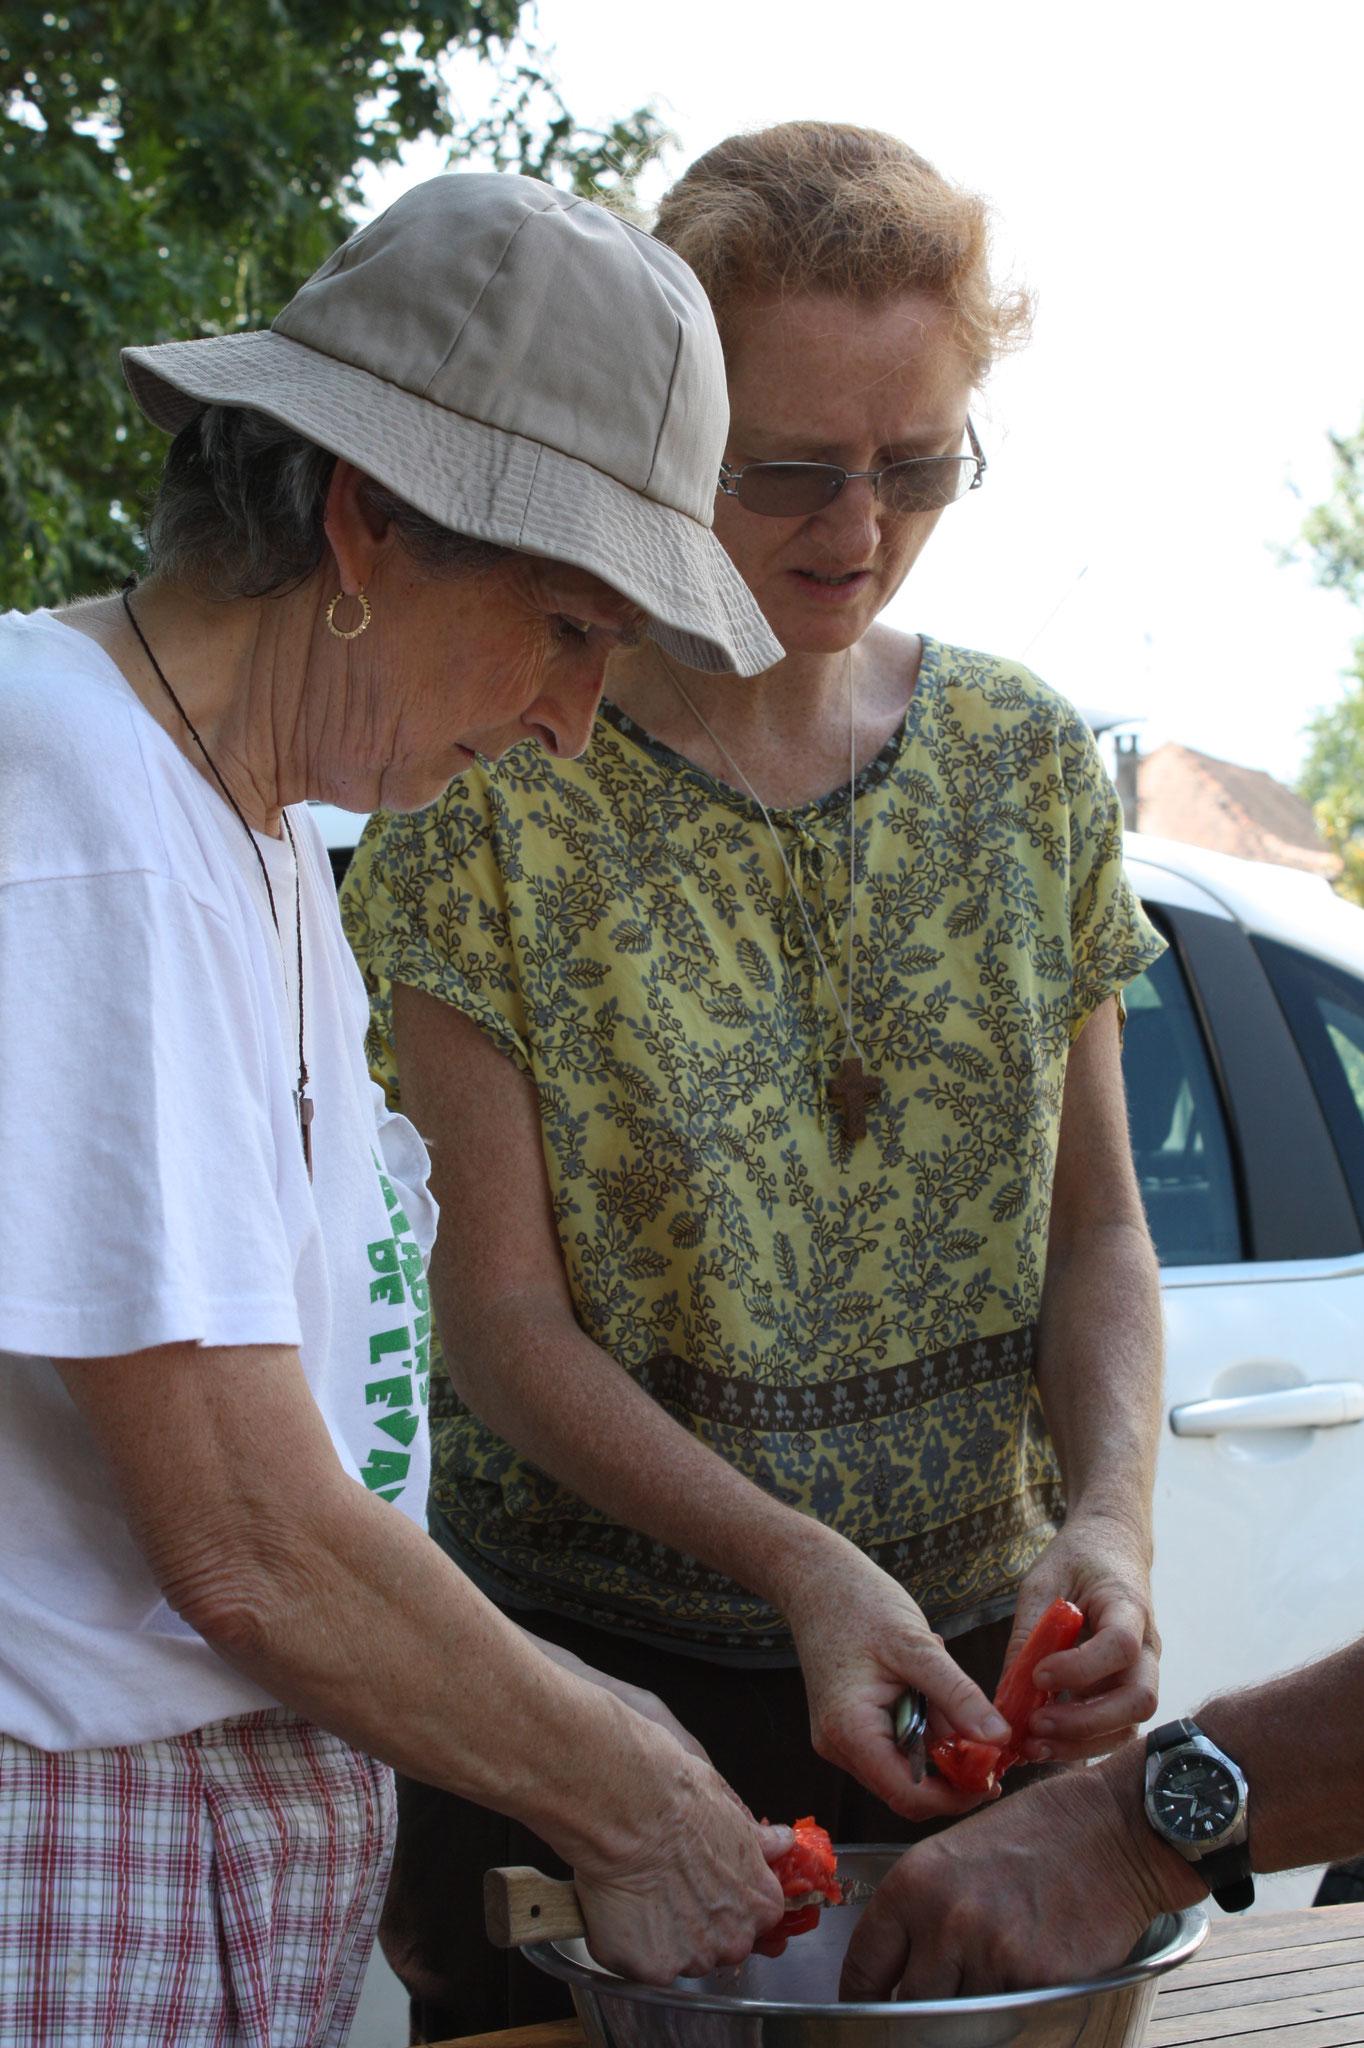 Dim. 5 août 2018 : déjeuner à St Peyronis